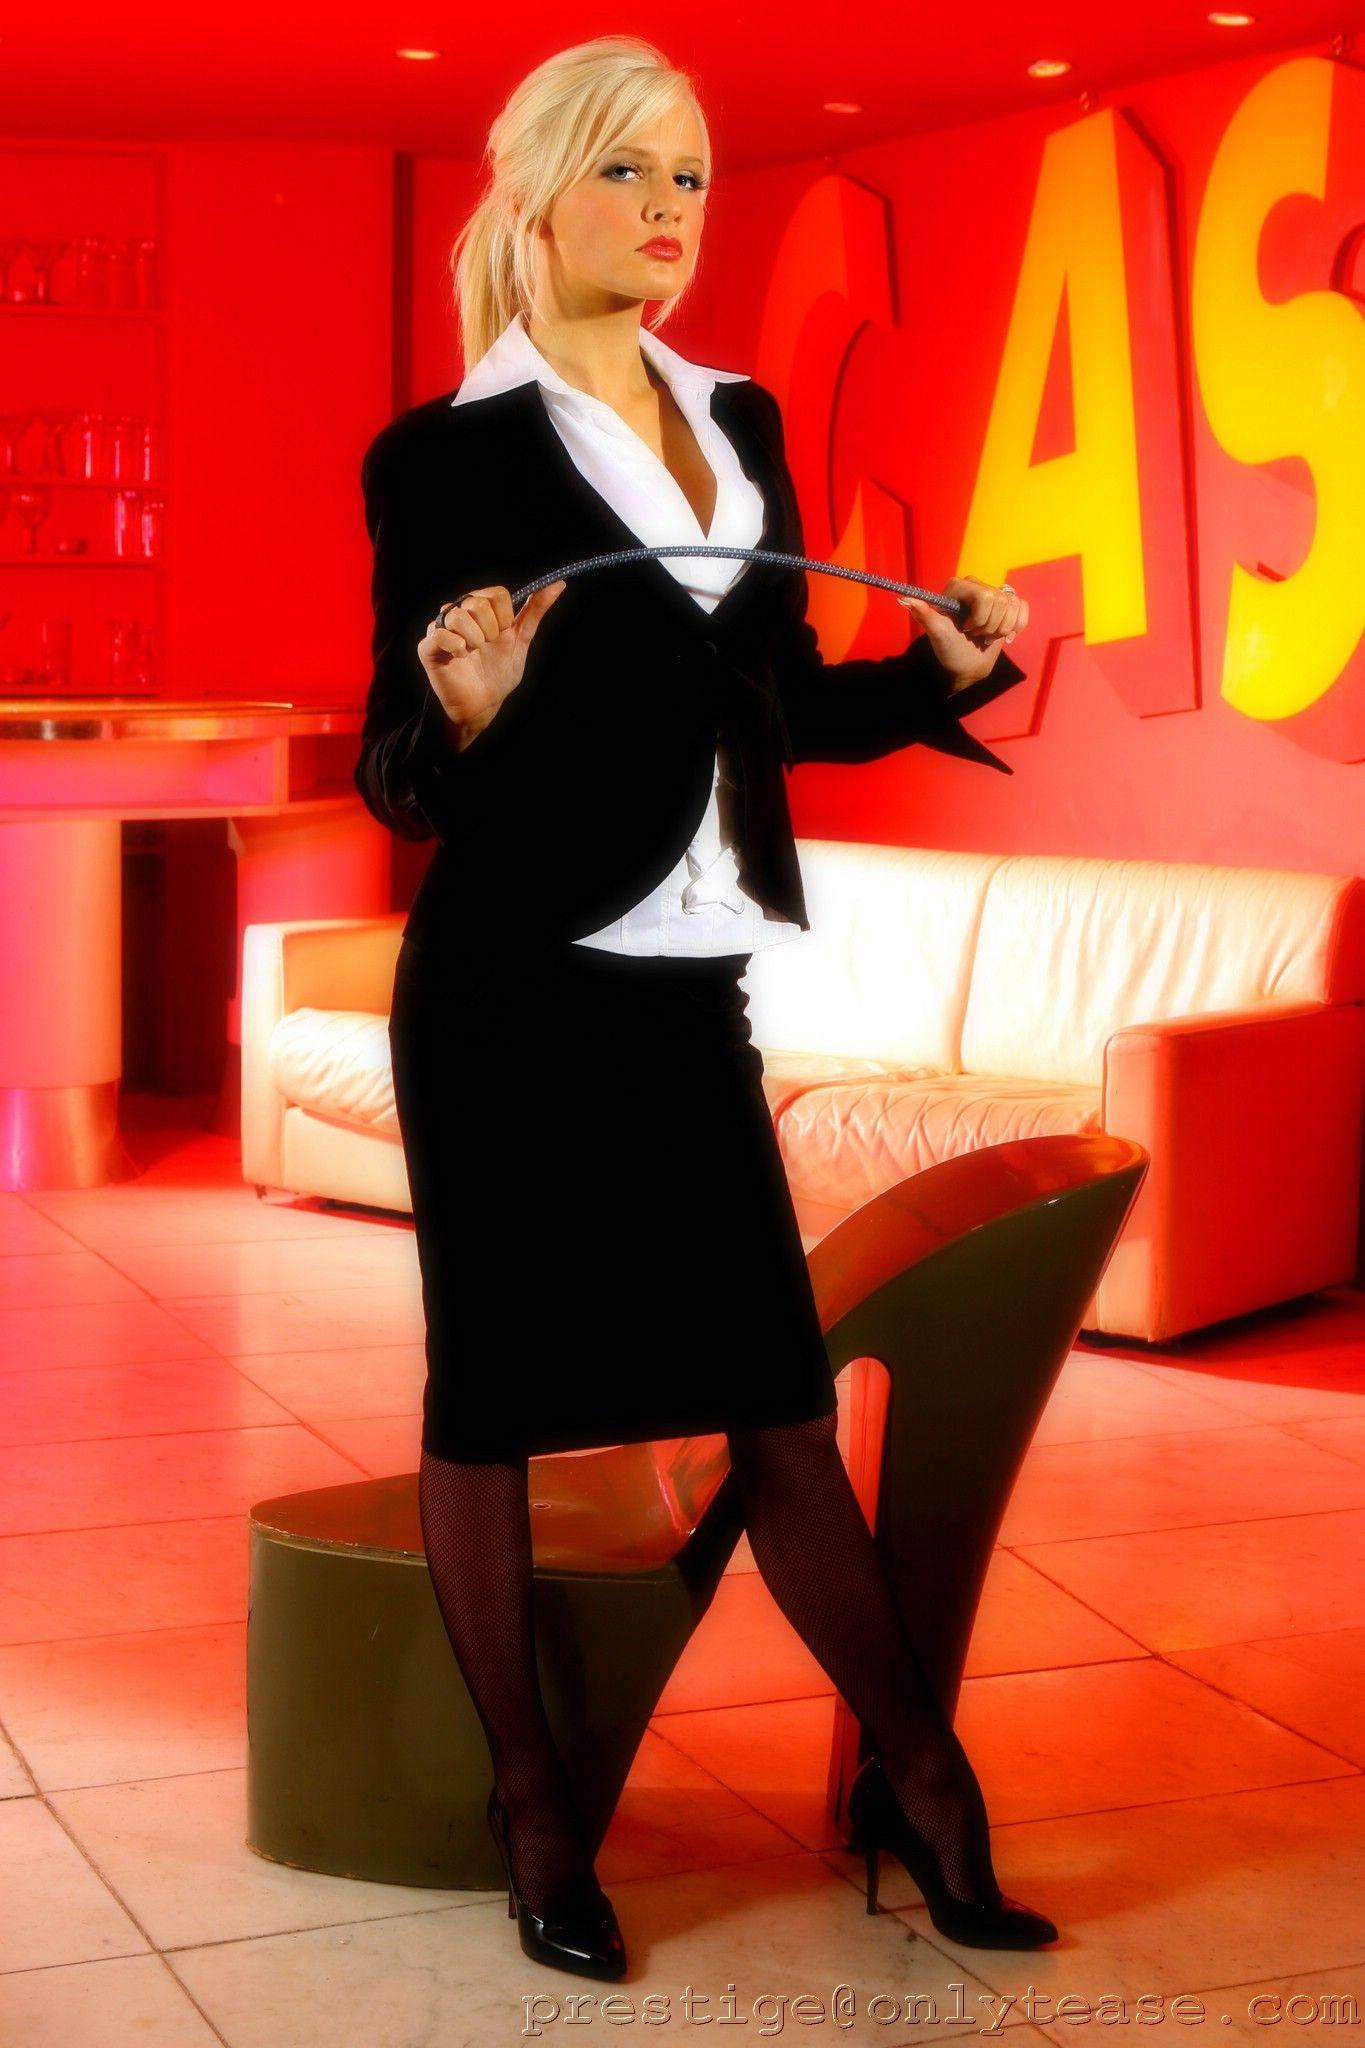 Dina De Santis,Hana Mae Lee XXX clips Edith Evans ?stage and film roles,Erica Roby